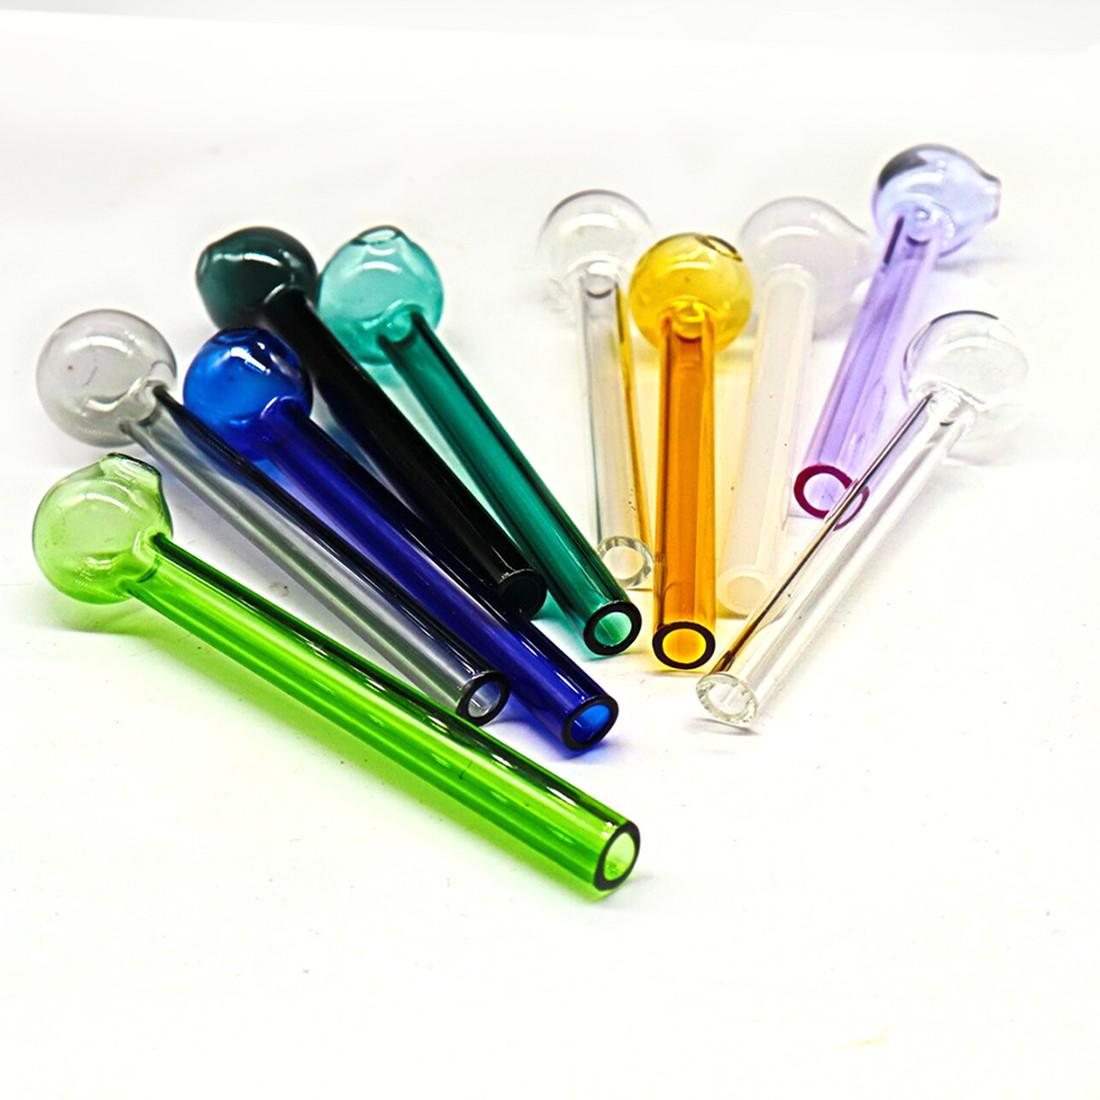 4 pollici (10 cm) Colorato Pyrex Bruciatore di olio Bruciatore di olio trasparente Bruciatore di olio di vetro Tubo di vetro Tubi di vetro Tubi di vetro Tubi Acqua Tubi ACQUA FY2305